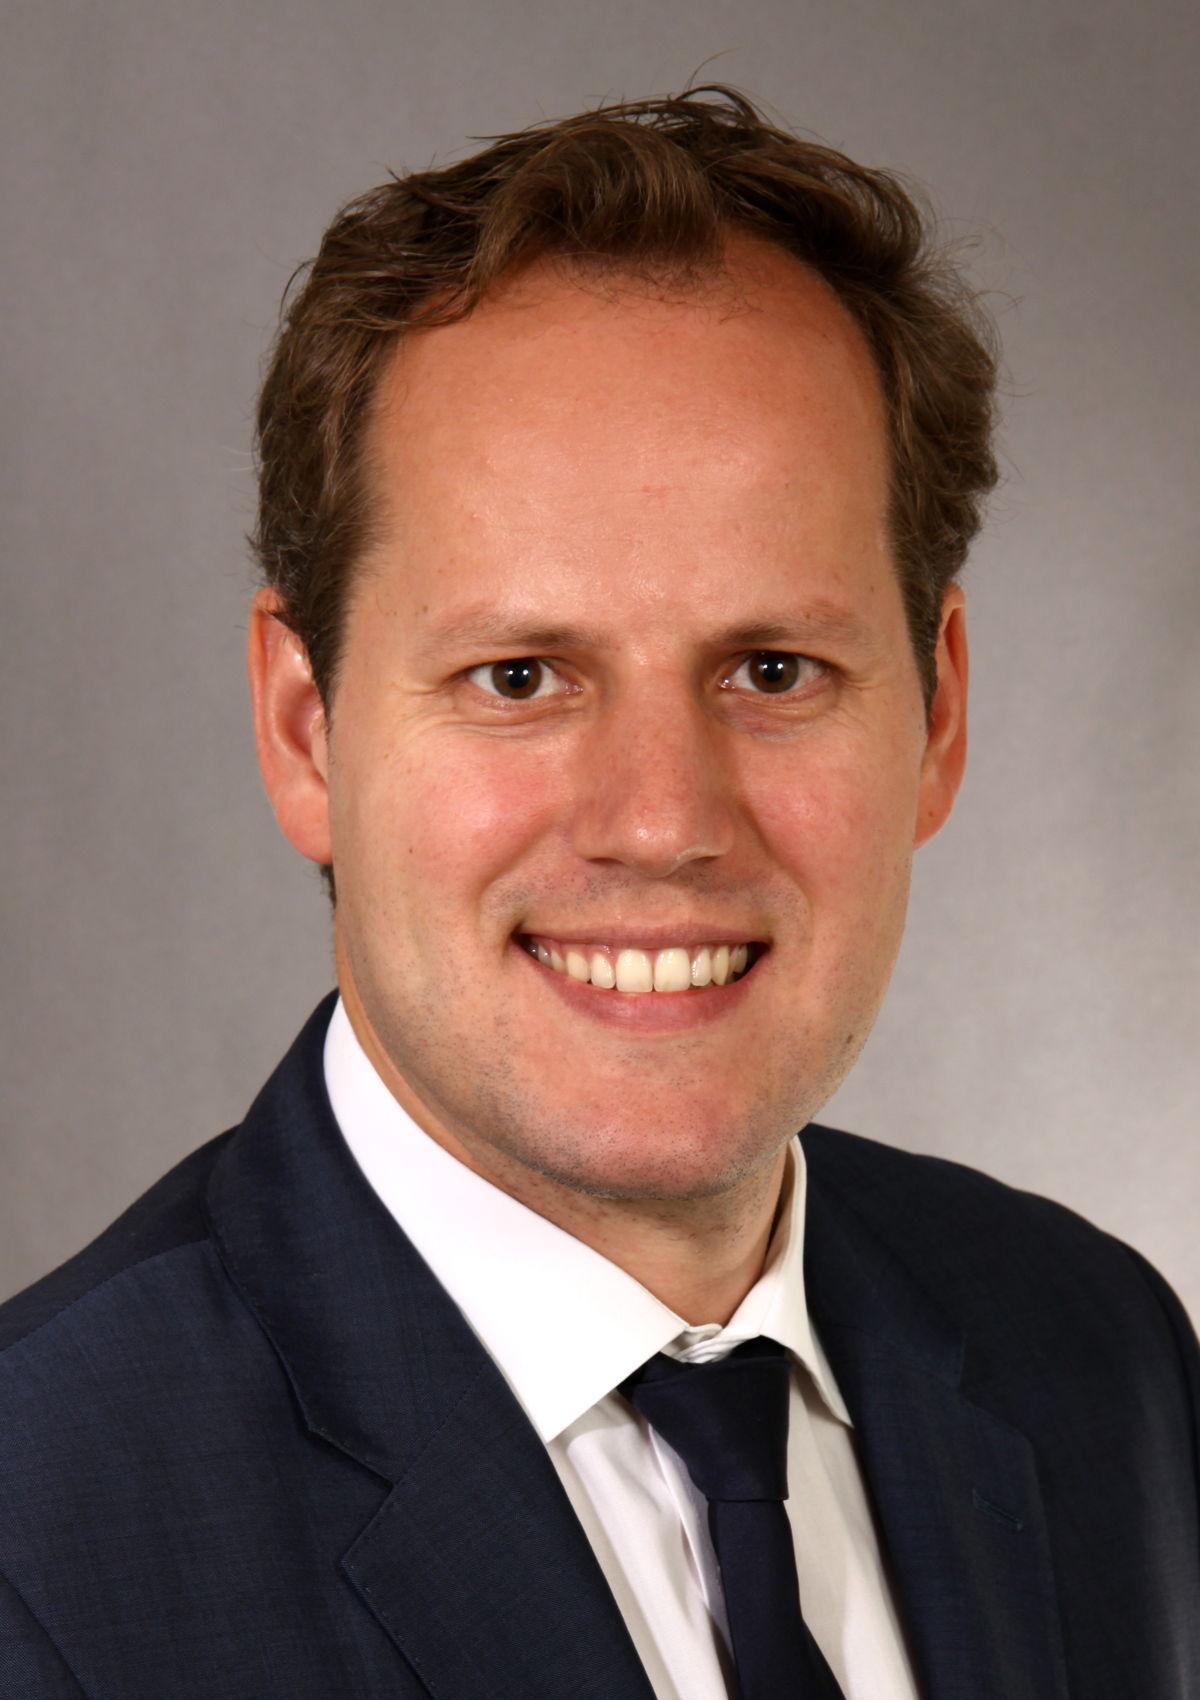 Sebastian Grabert ist neuer Head of IR bei Compleo